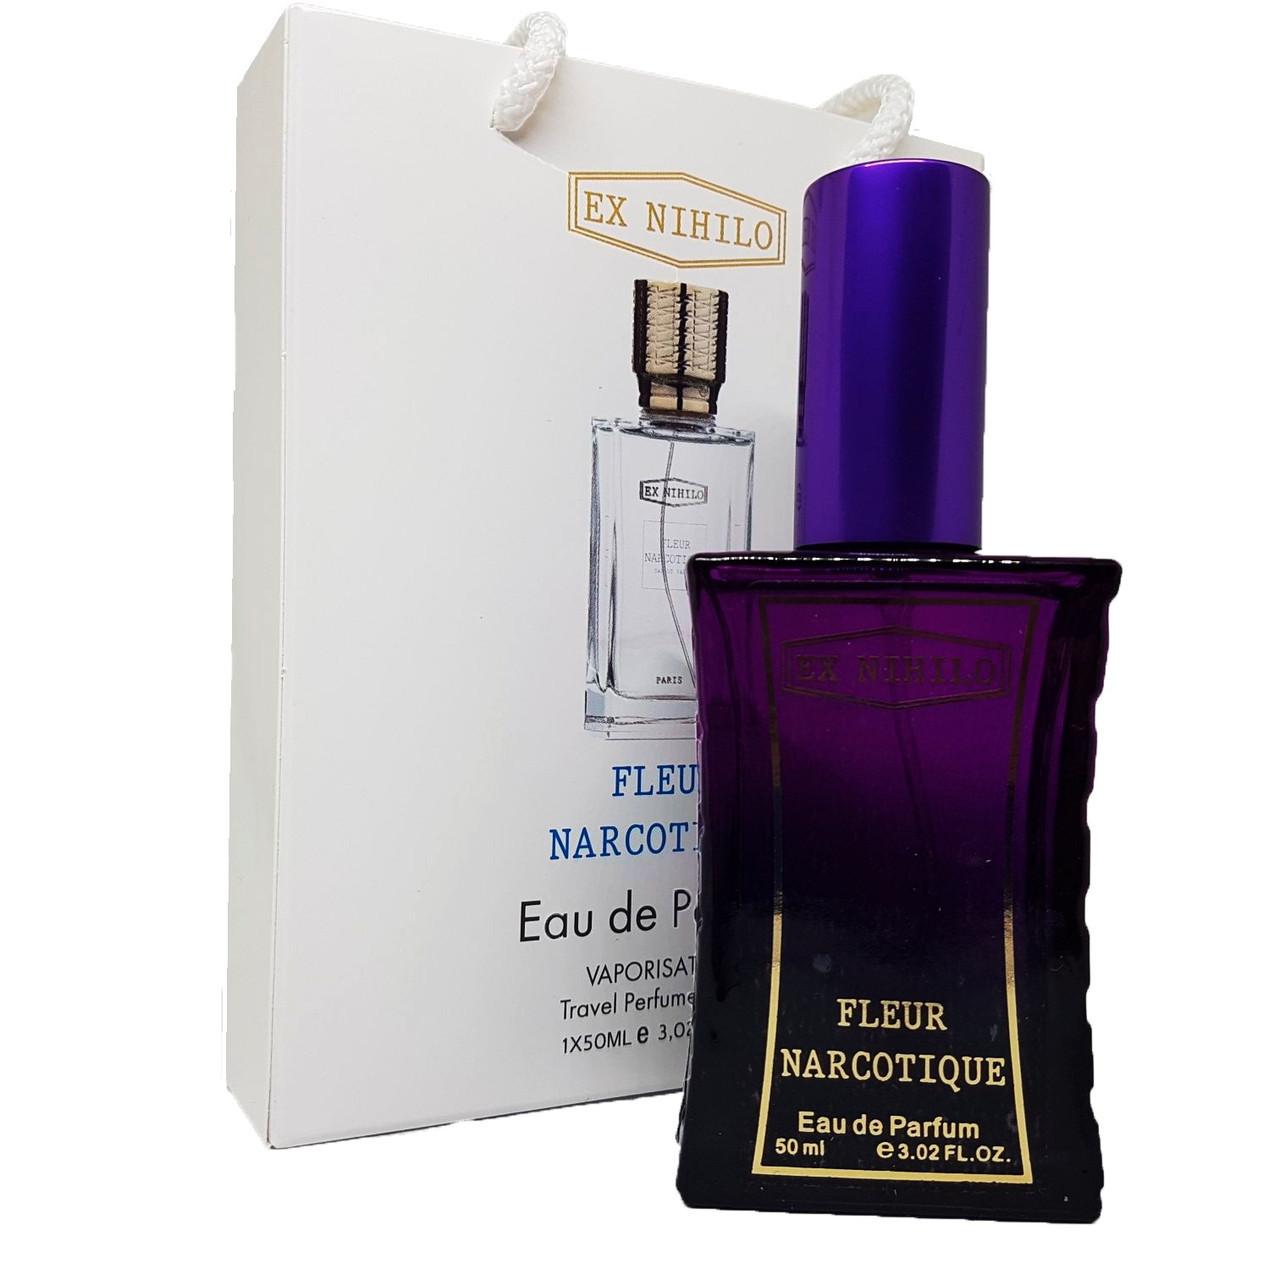 Ex Nihilo Fleur Narcotique - Travel Perfume 50ml